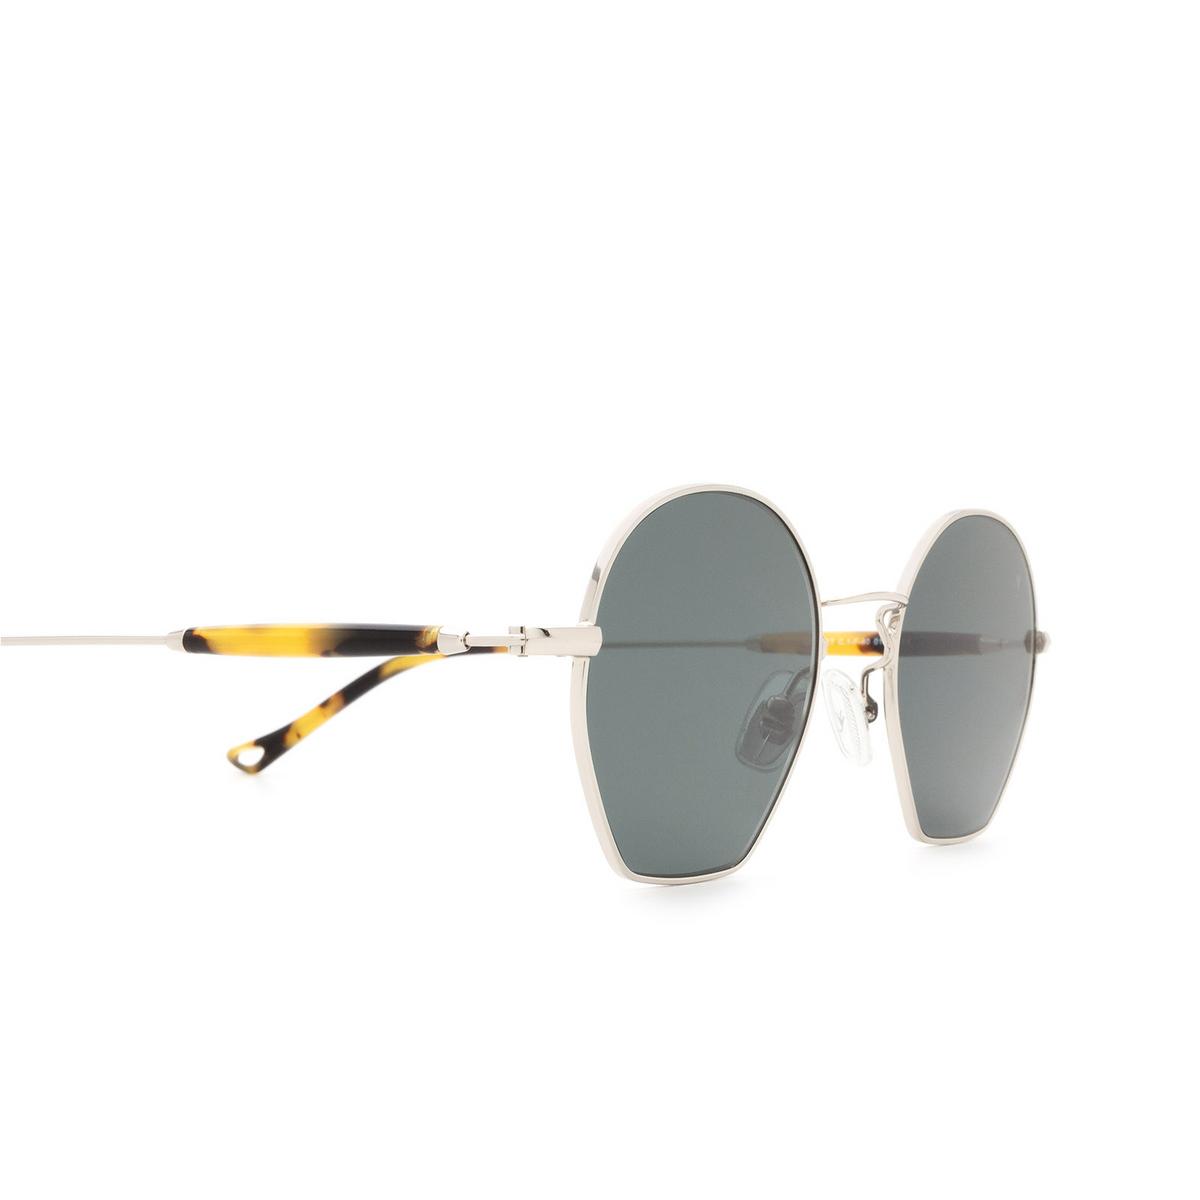 eyepetizer-guimet-c1-f-40 (2)